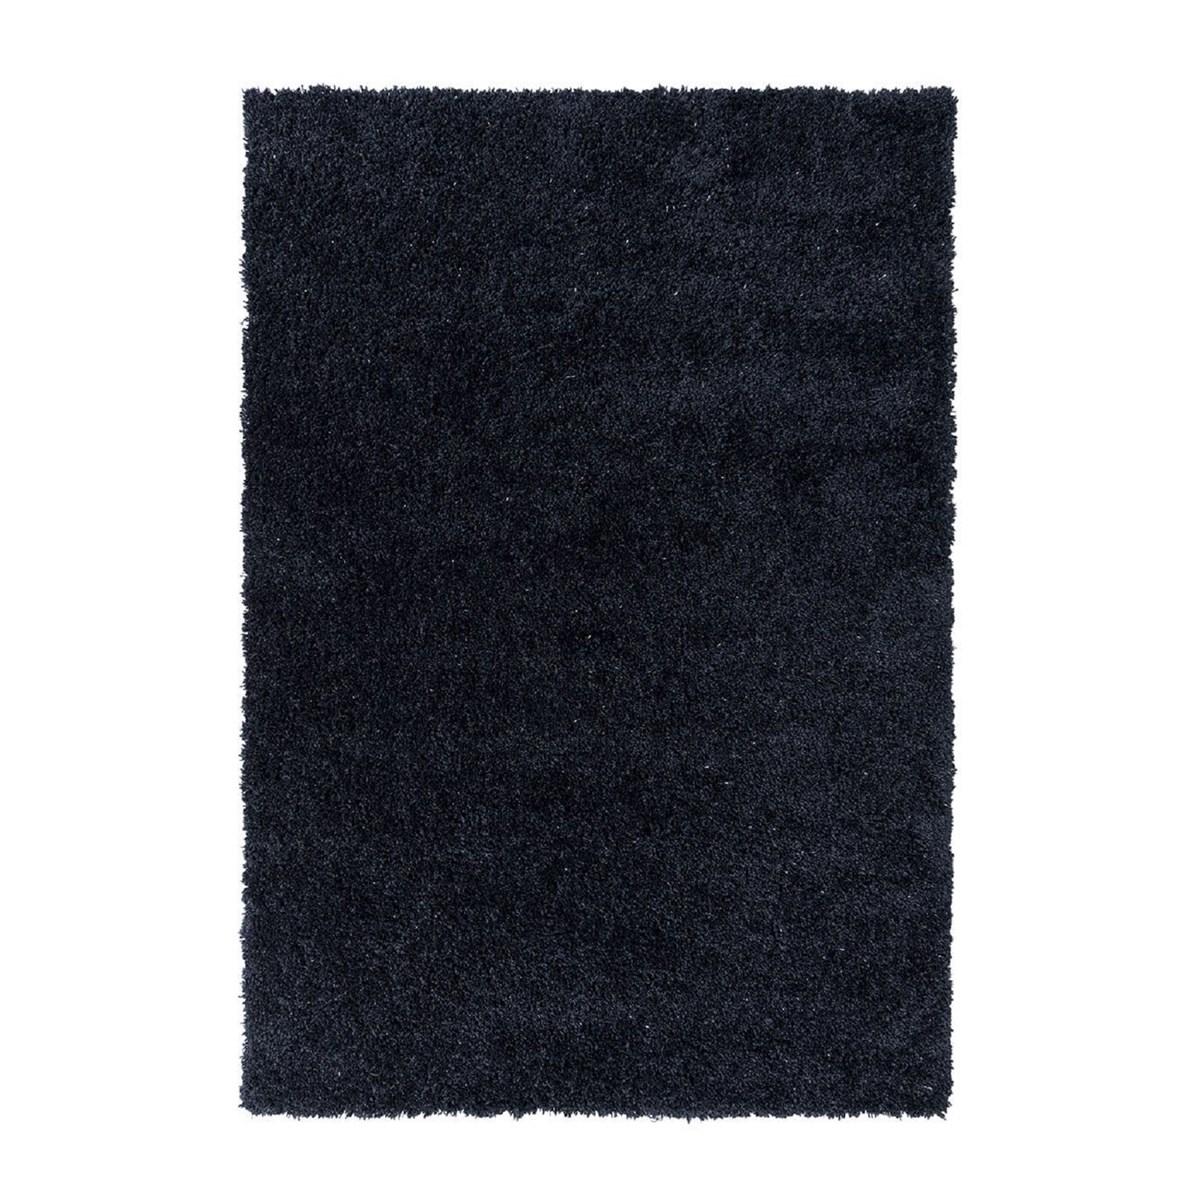 Tapis shaggy en Polyester Bleu nuit 120x170 cm